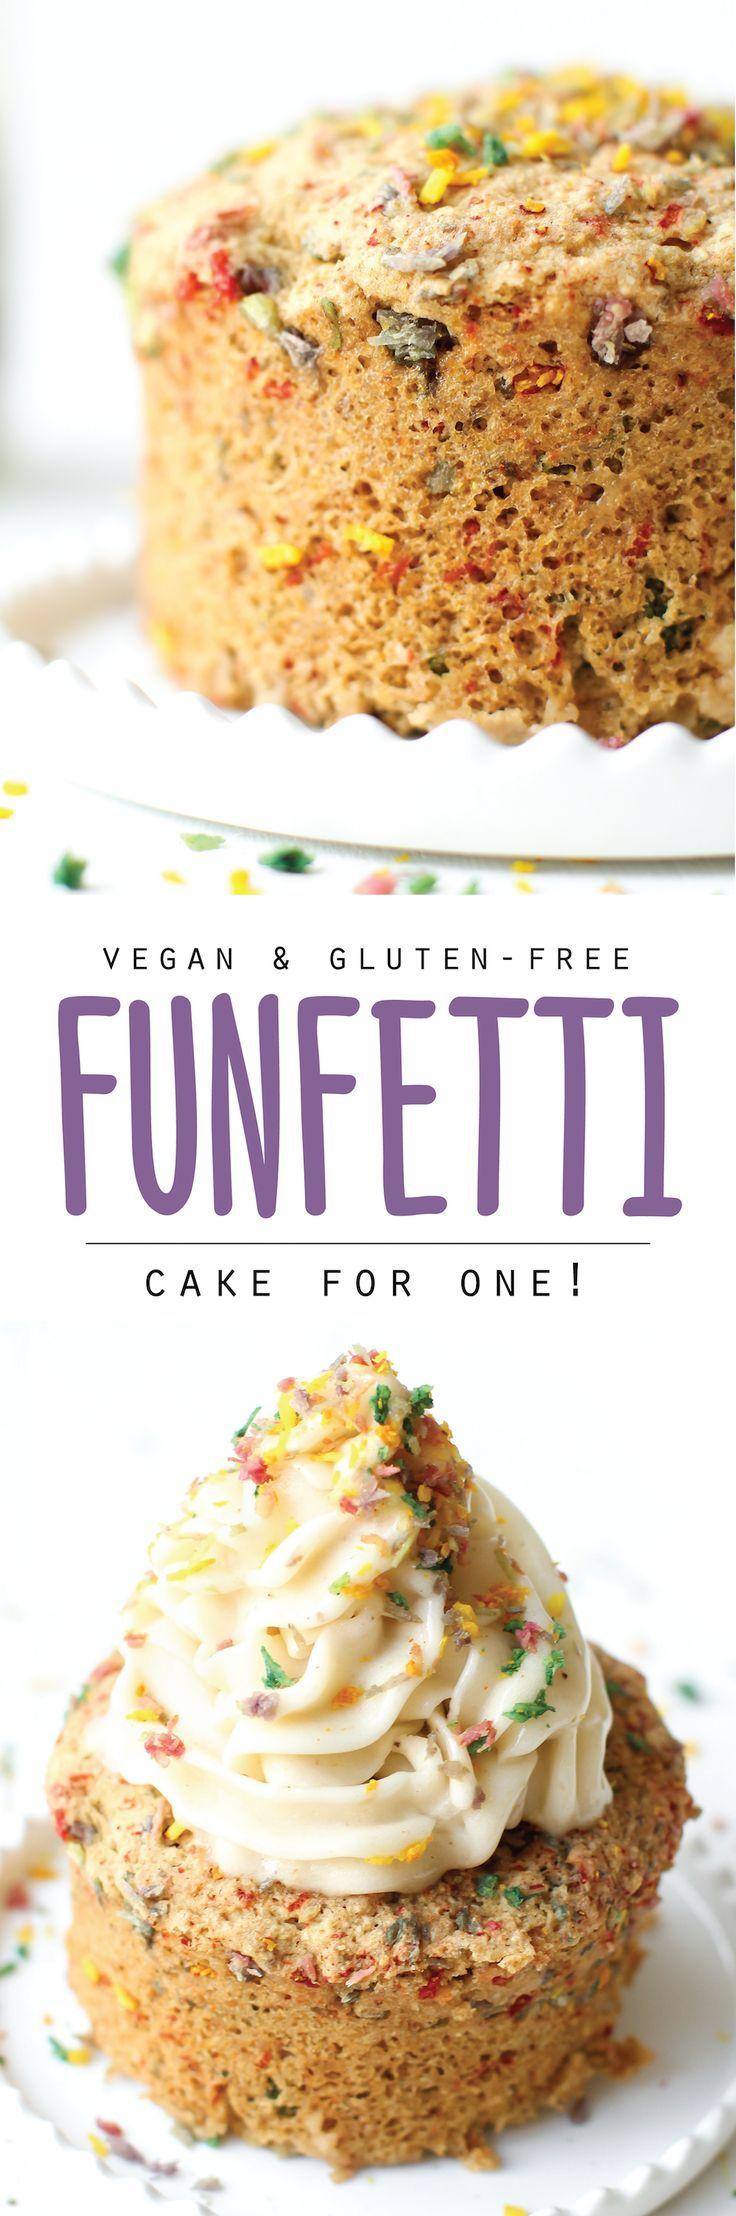 Funfetti Mug Cake Recipe To be Ice and Mug cakes